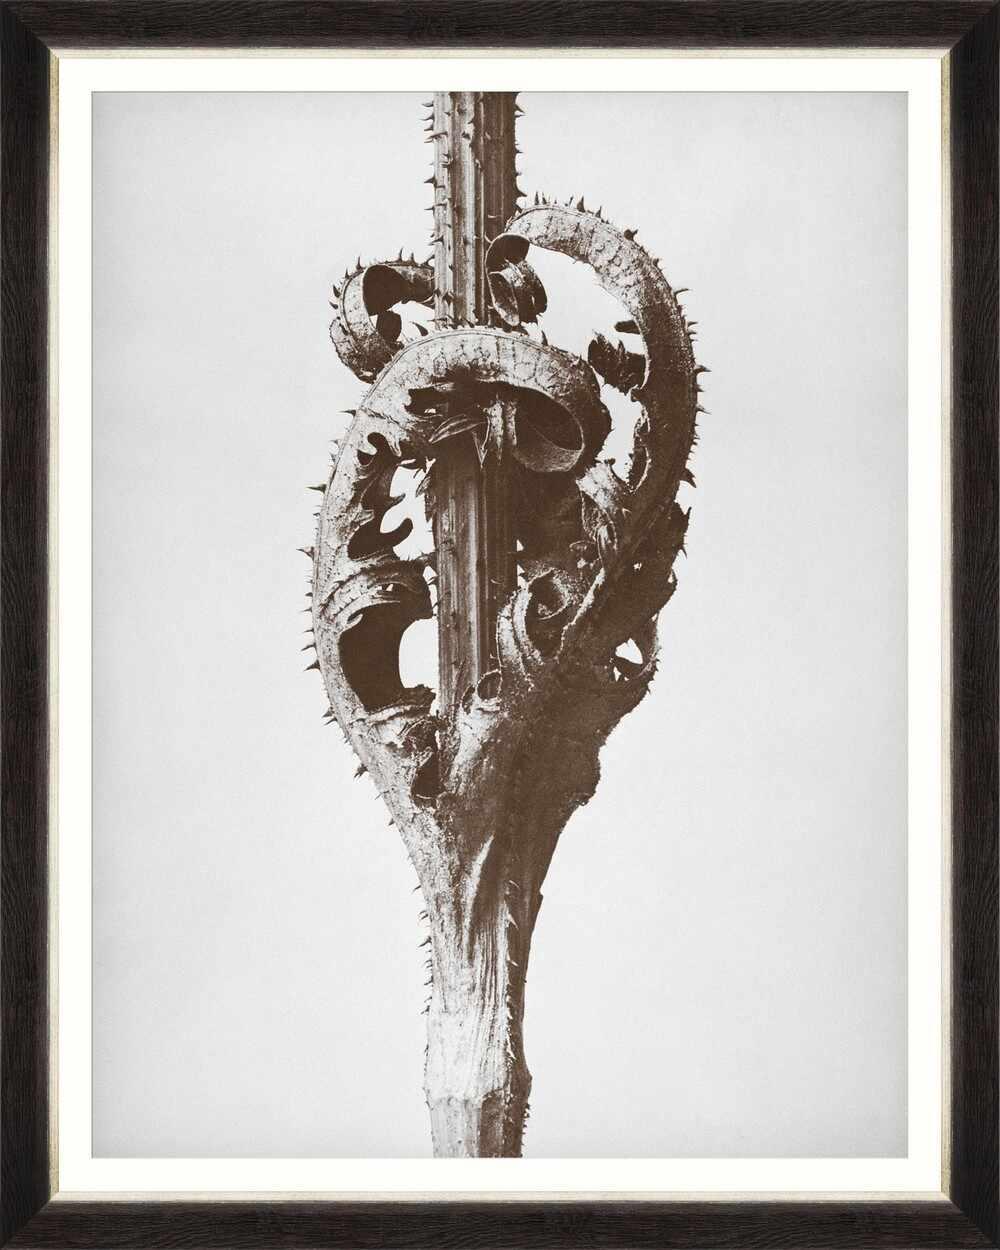 Tablou Framed Art Dipsacus Laciniatus By Blossfeldt la pret 625 lei